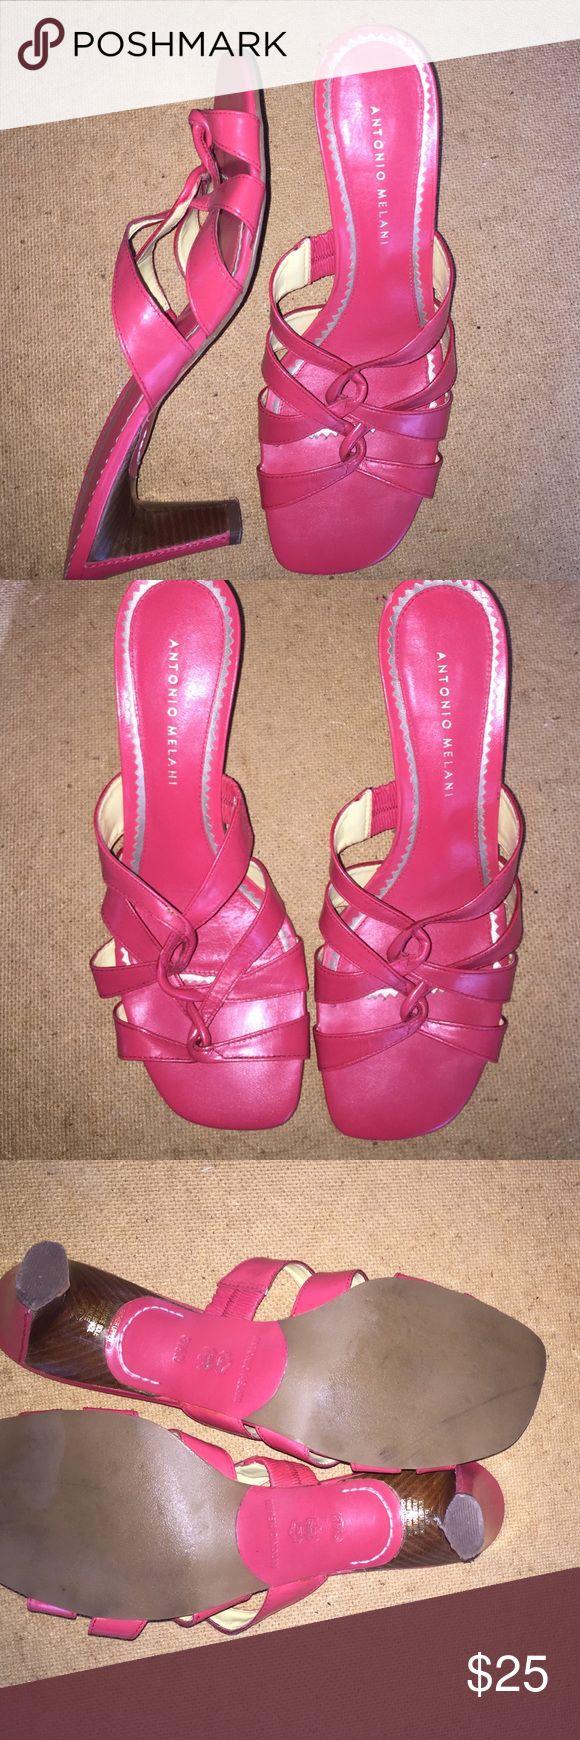 "Antonio Melani 2"" heel strape coral sandals Antonio Melani coral sandals 2"" heels, worn once, will consider offers ANTONIO MELANI Shoes Sandals"